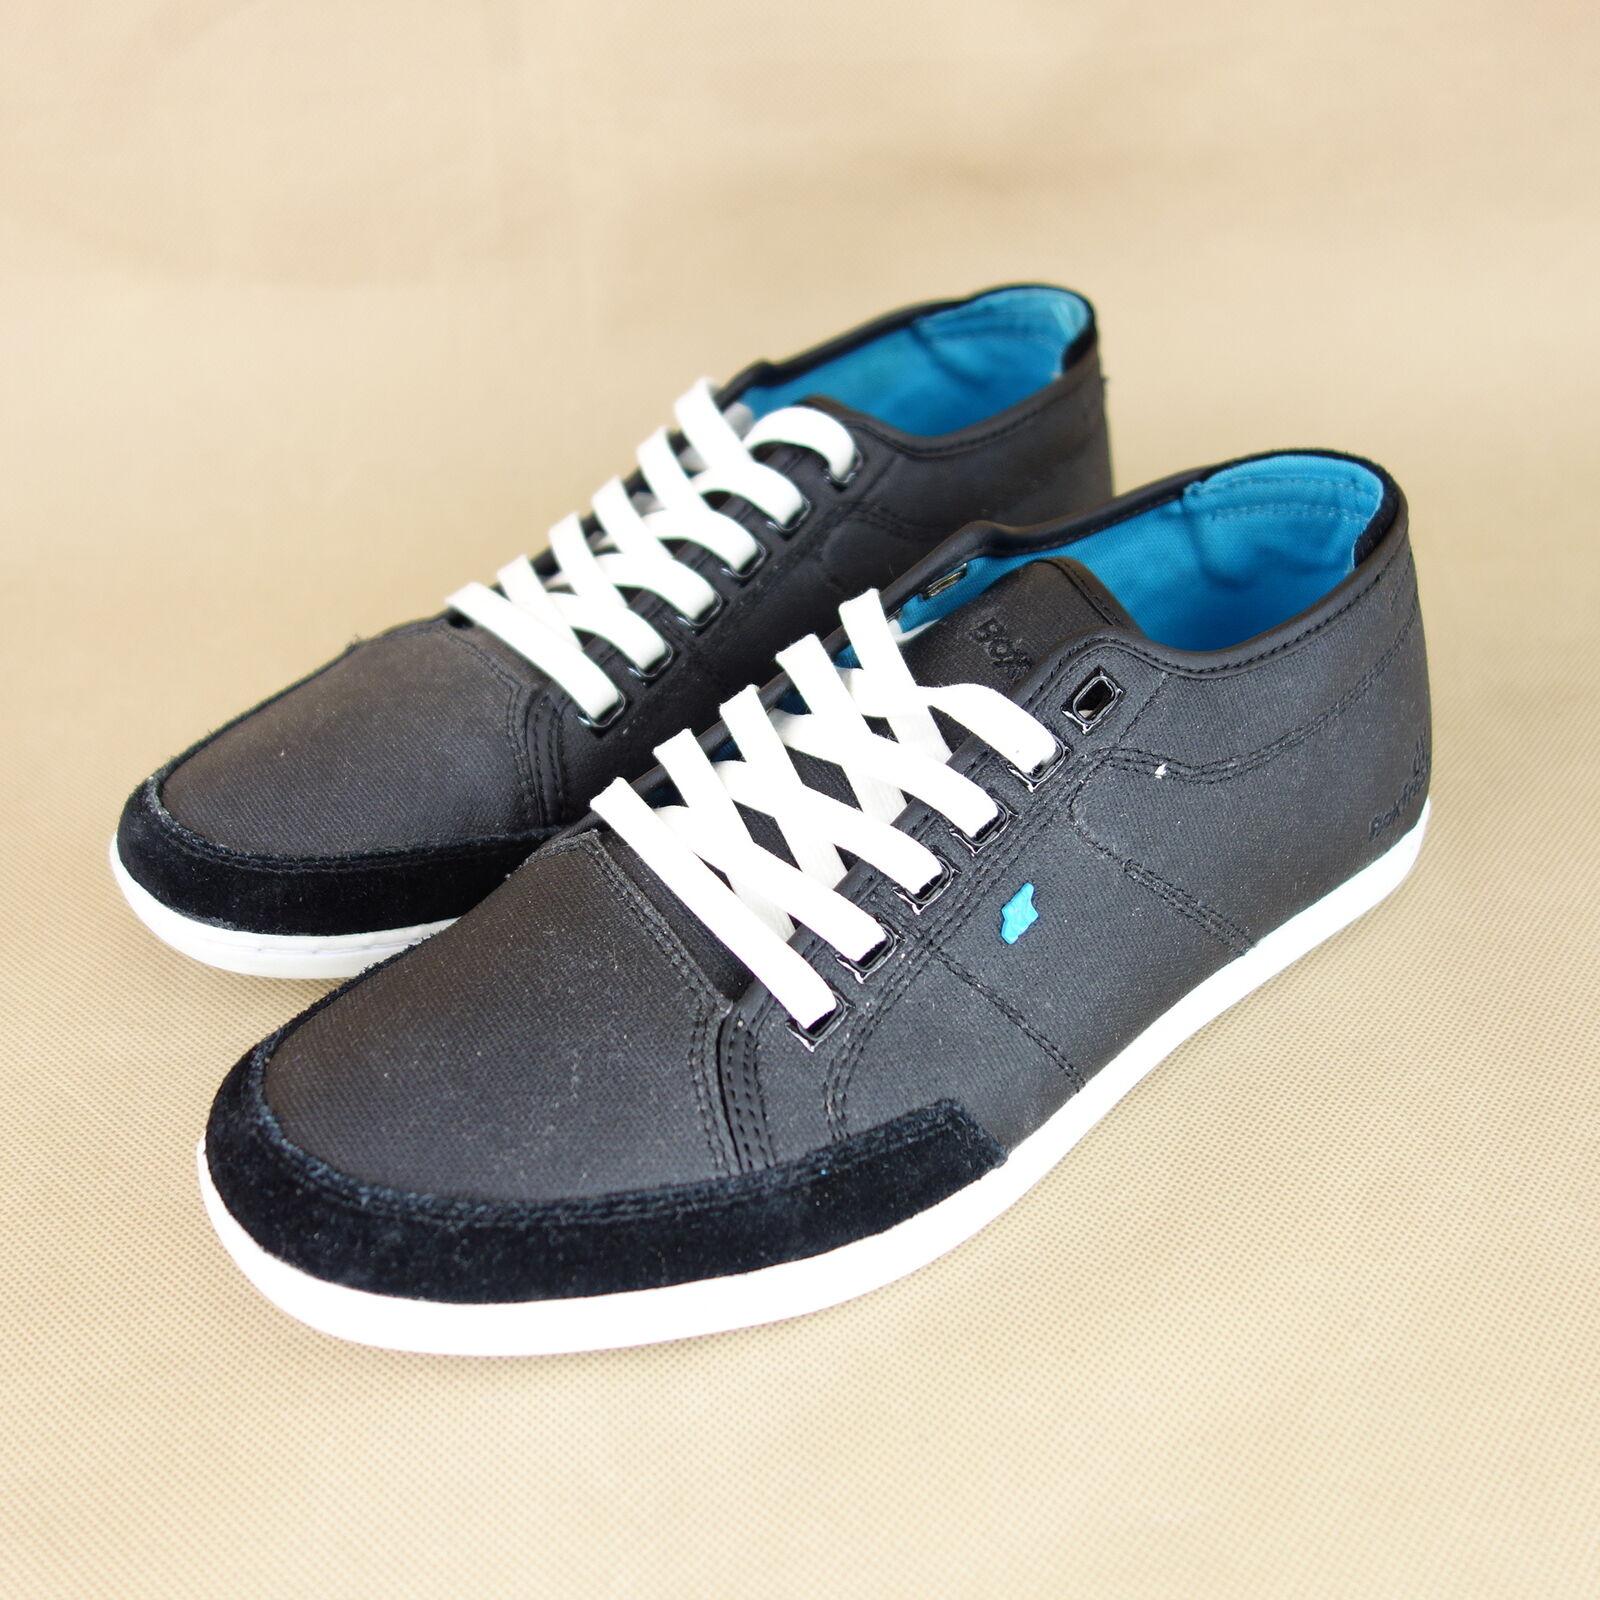 BOXFRESH Herren Schuhe Niedrig Sneaker Turnschuhe Gr 40 Sparko Schwarz  Schwarz Sparko NP 89 NEU 6c4328 b1db4df561